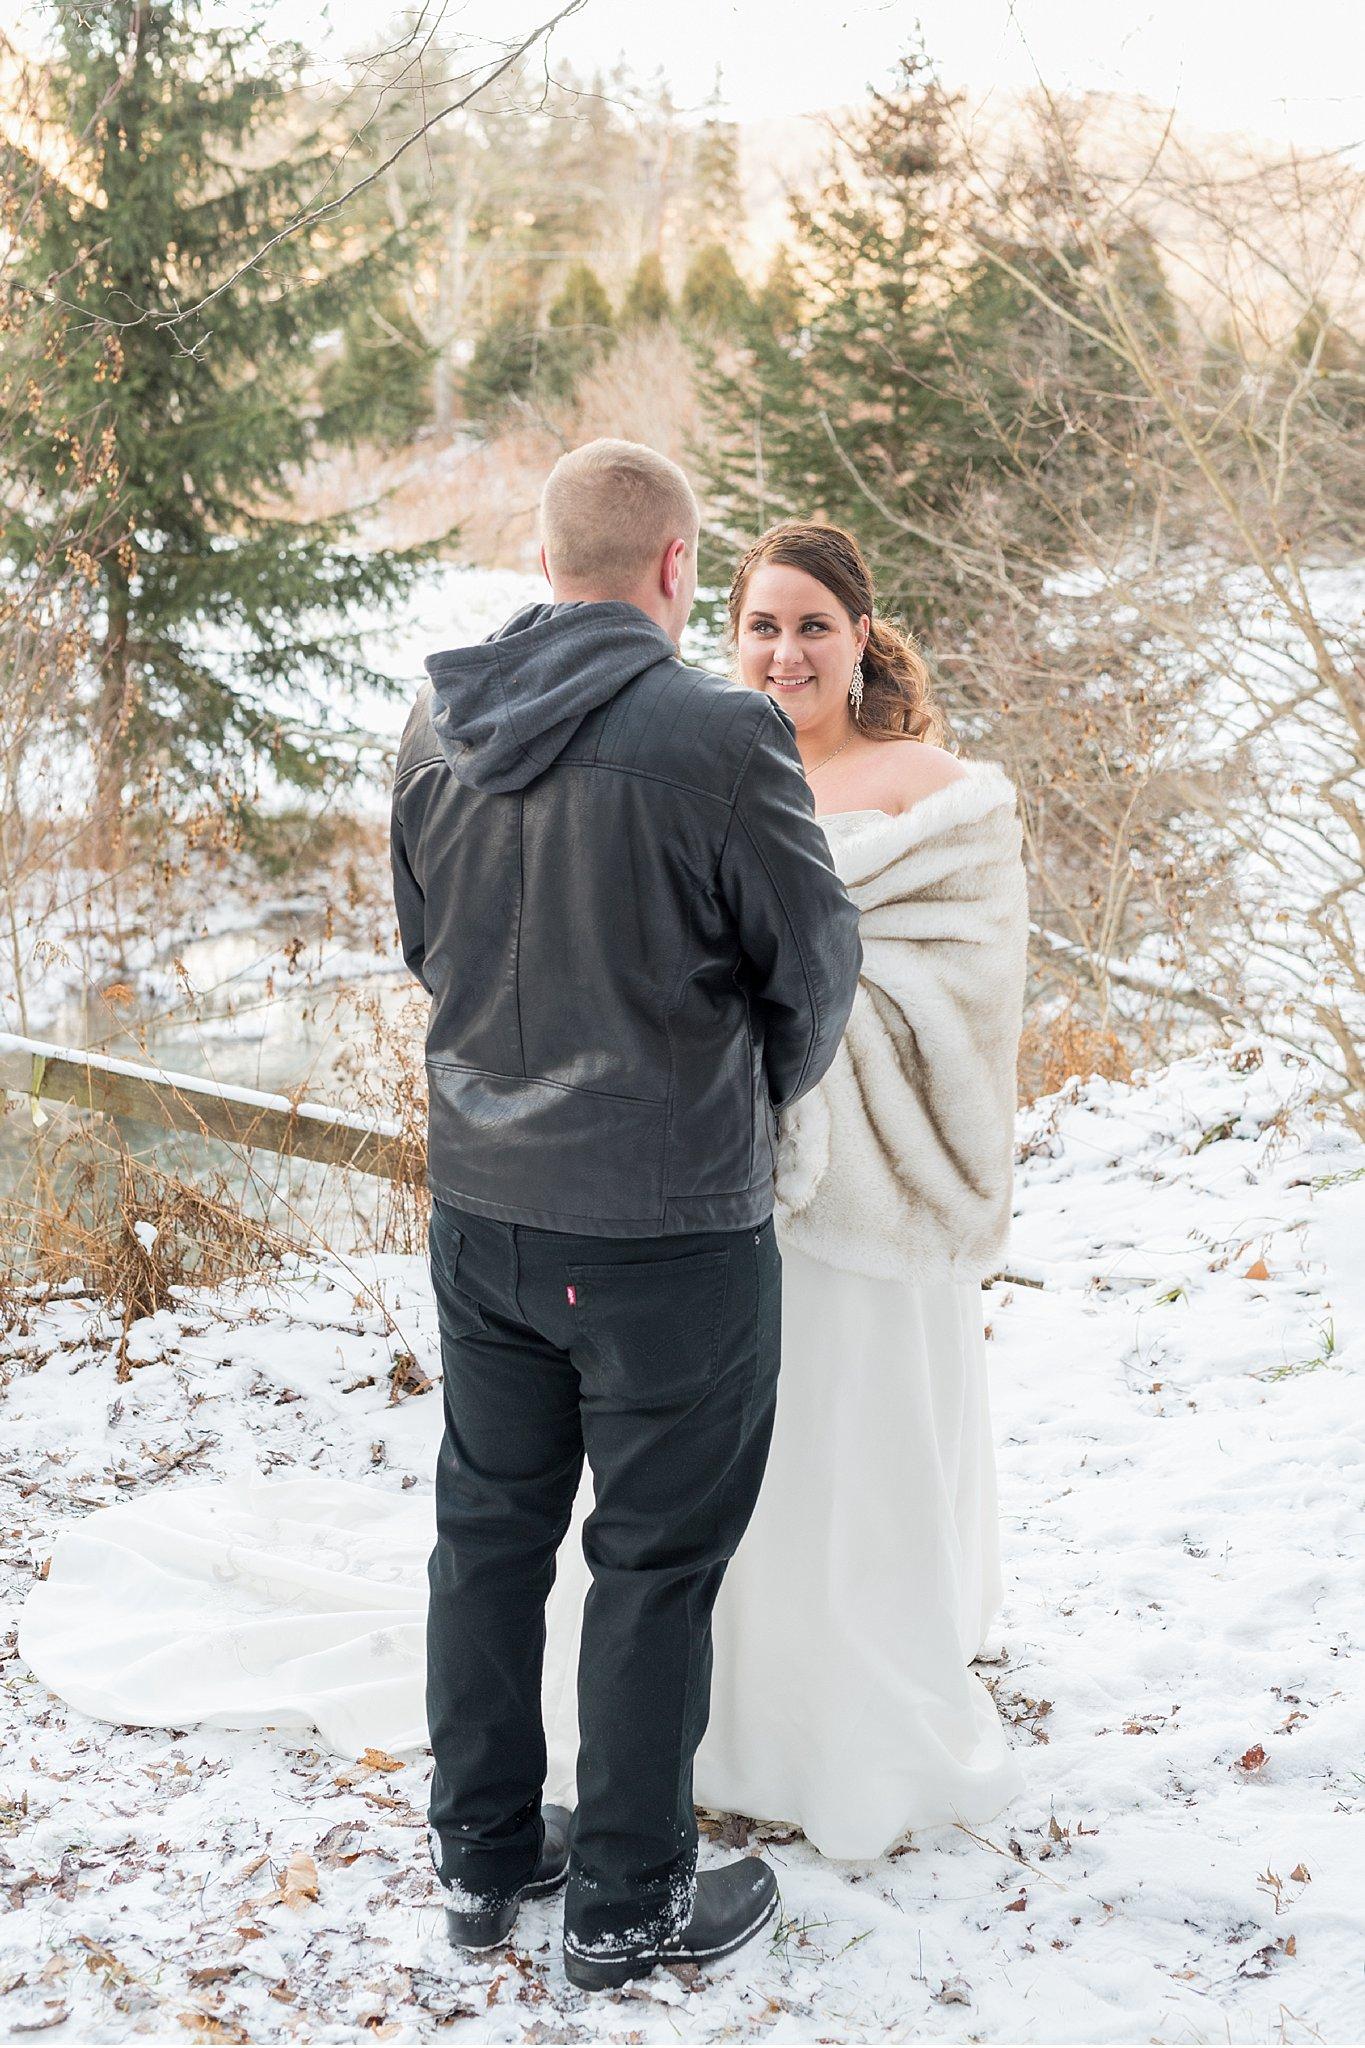 Winter elopemen snow covered vow exchange Coudersport PA photo_0599.jpg